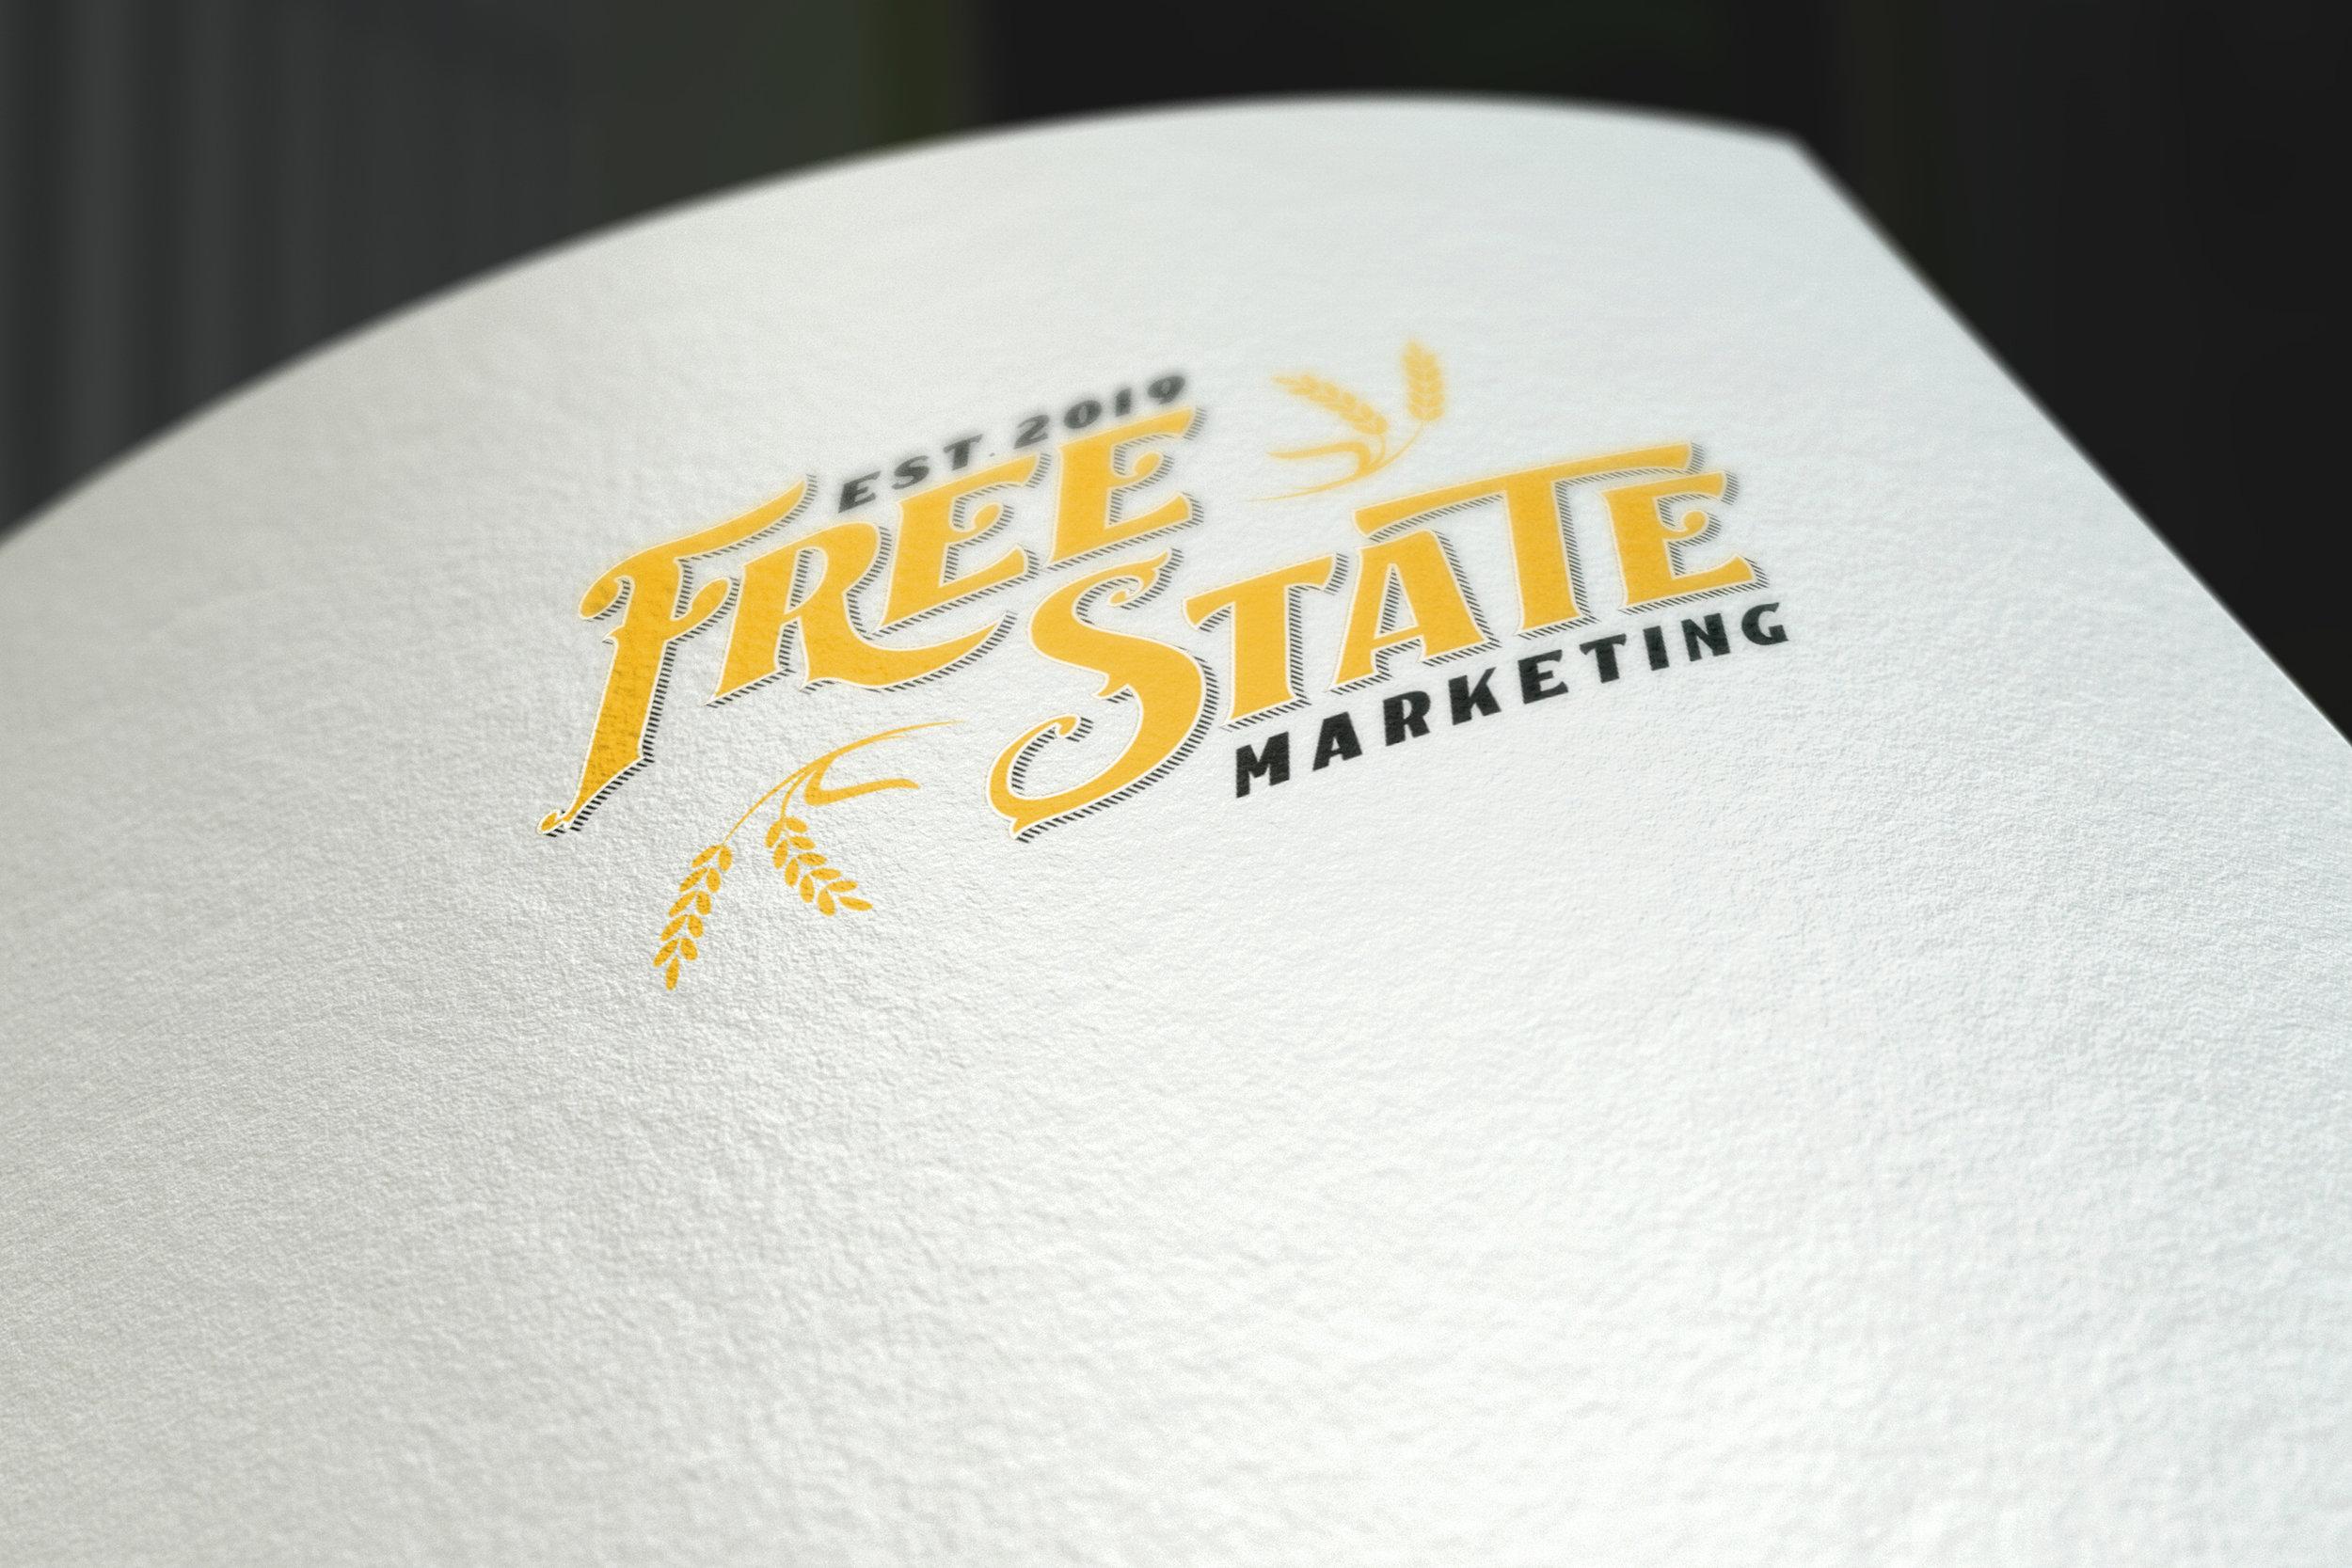 Free State Marketing Stationary.jpg